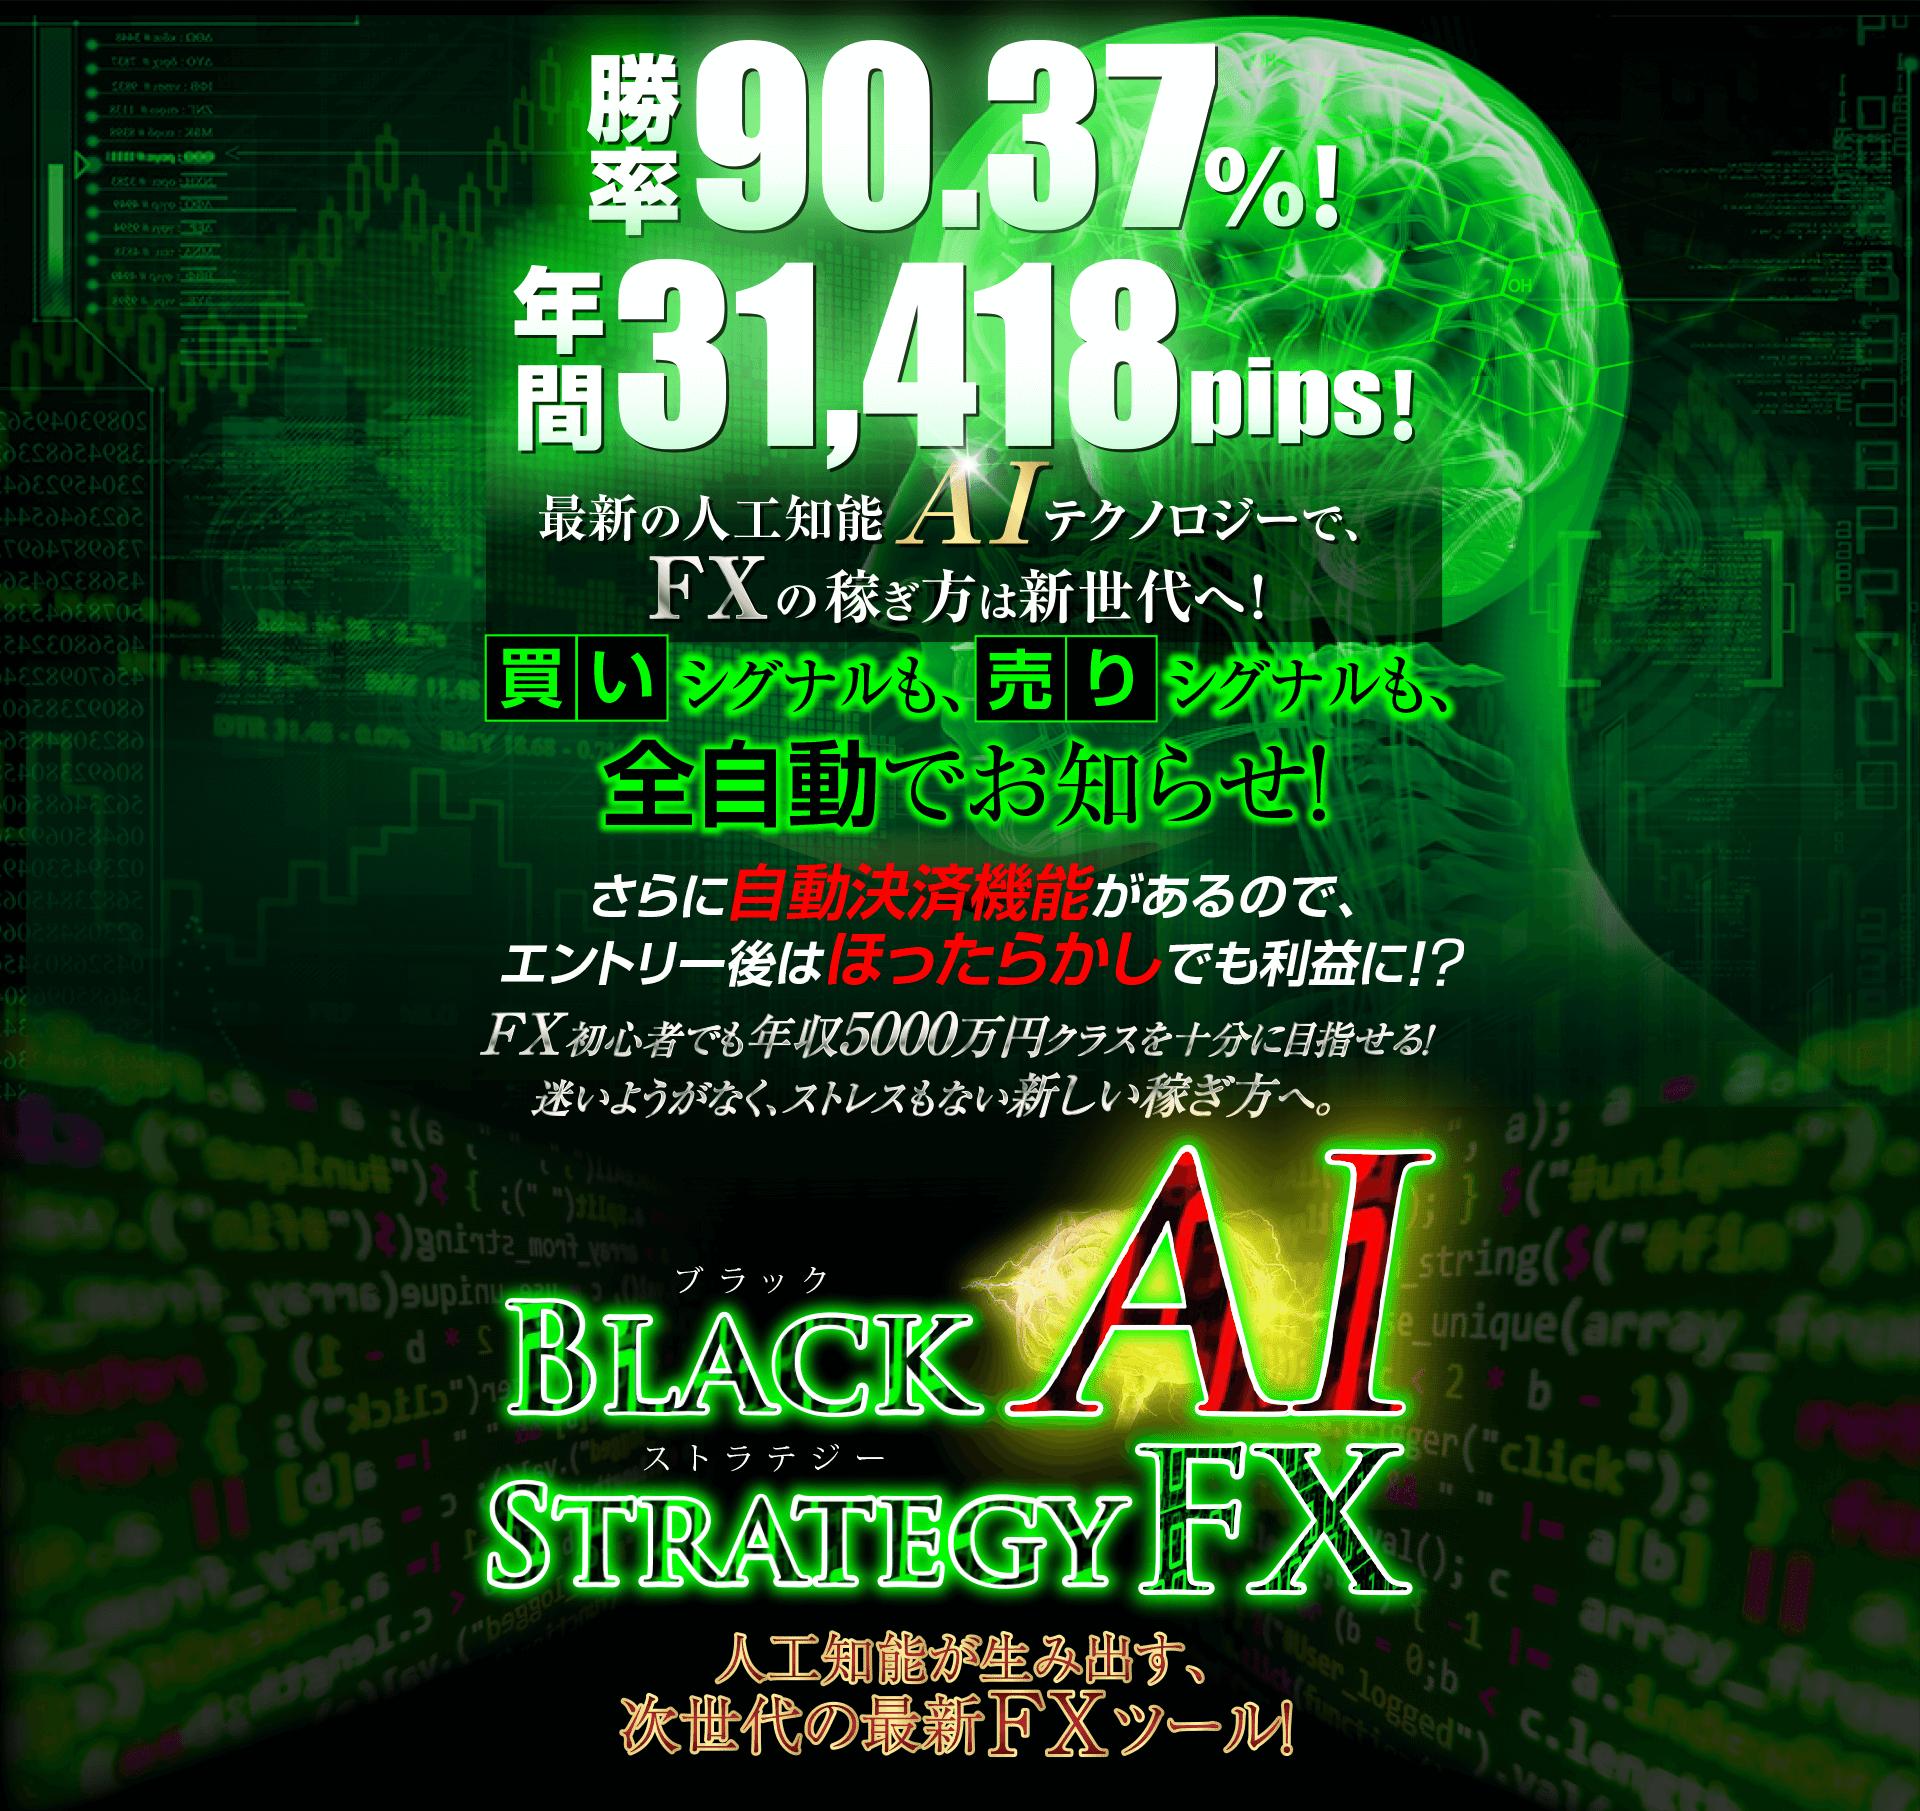 Black AI・ストラテジーfx